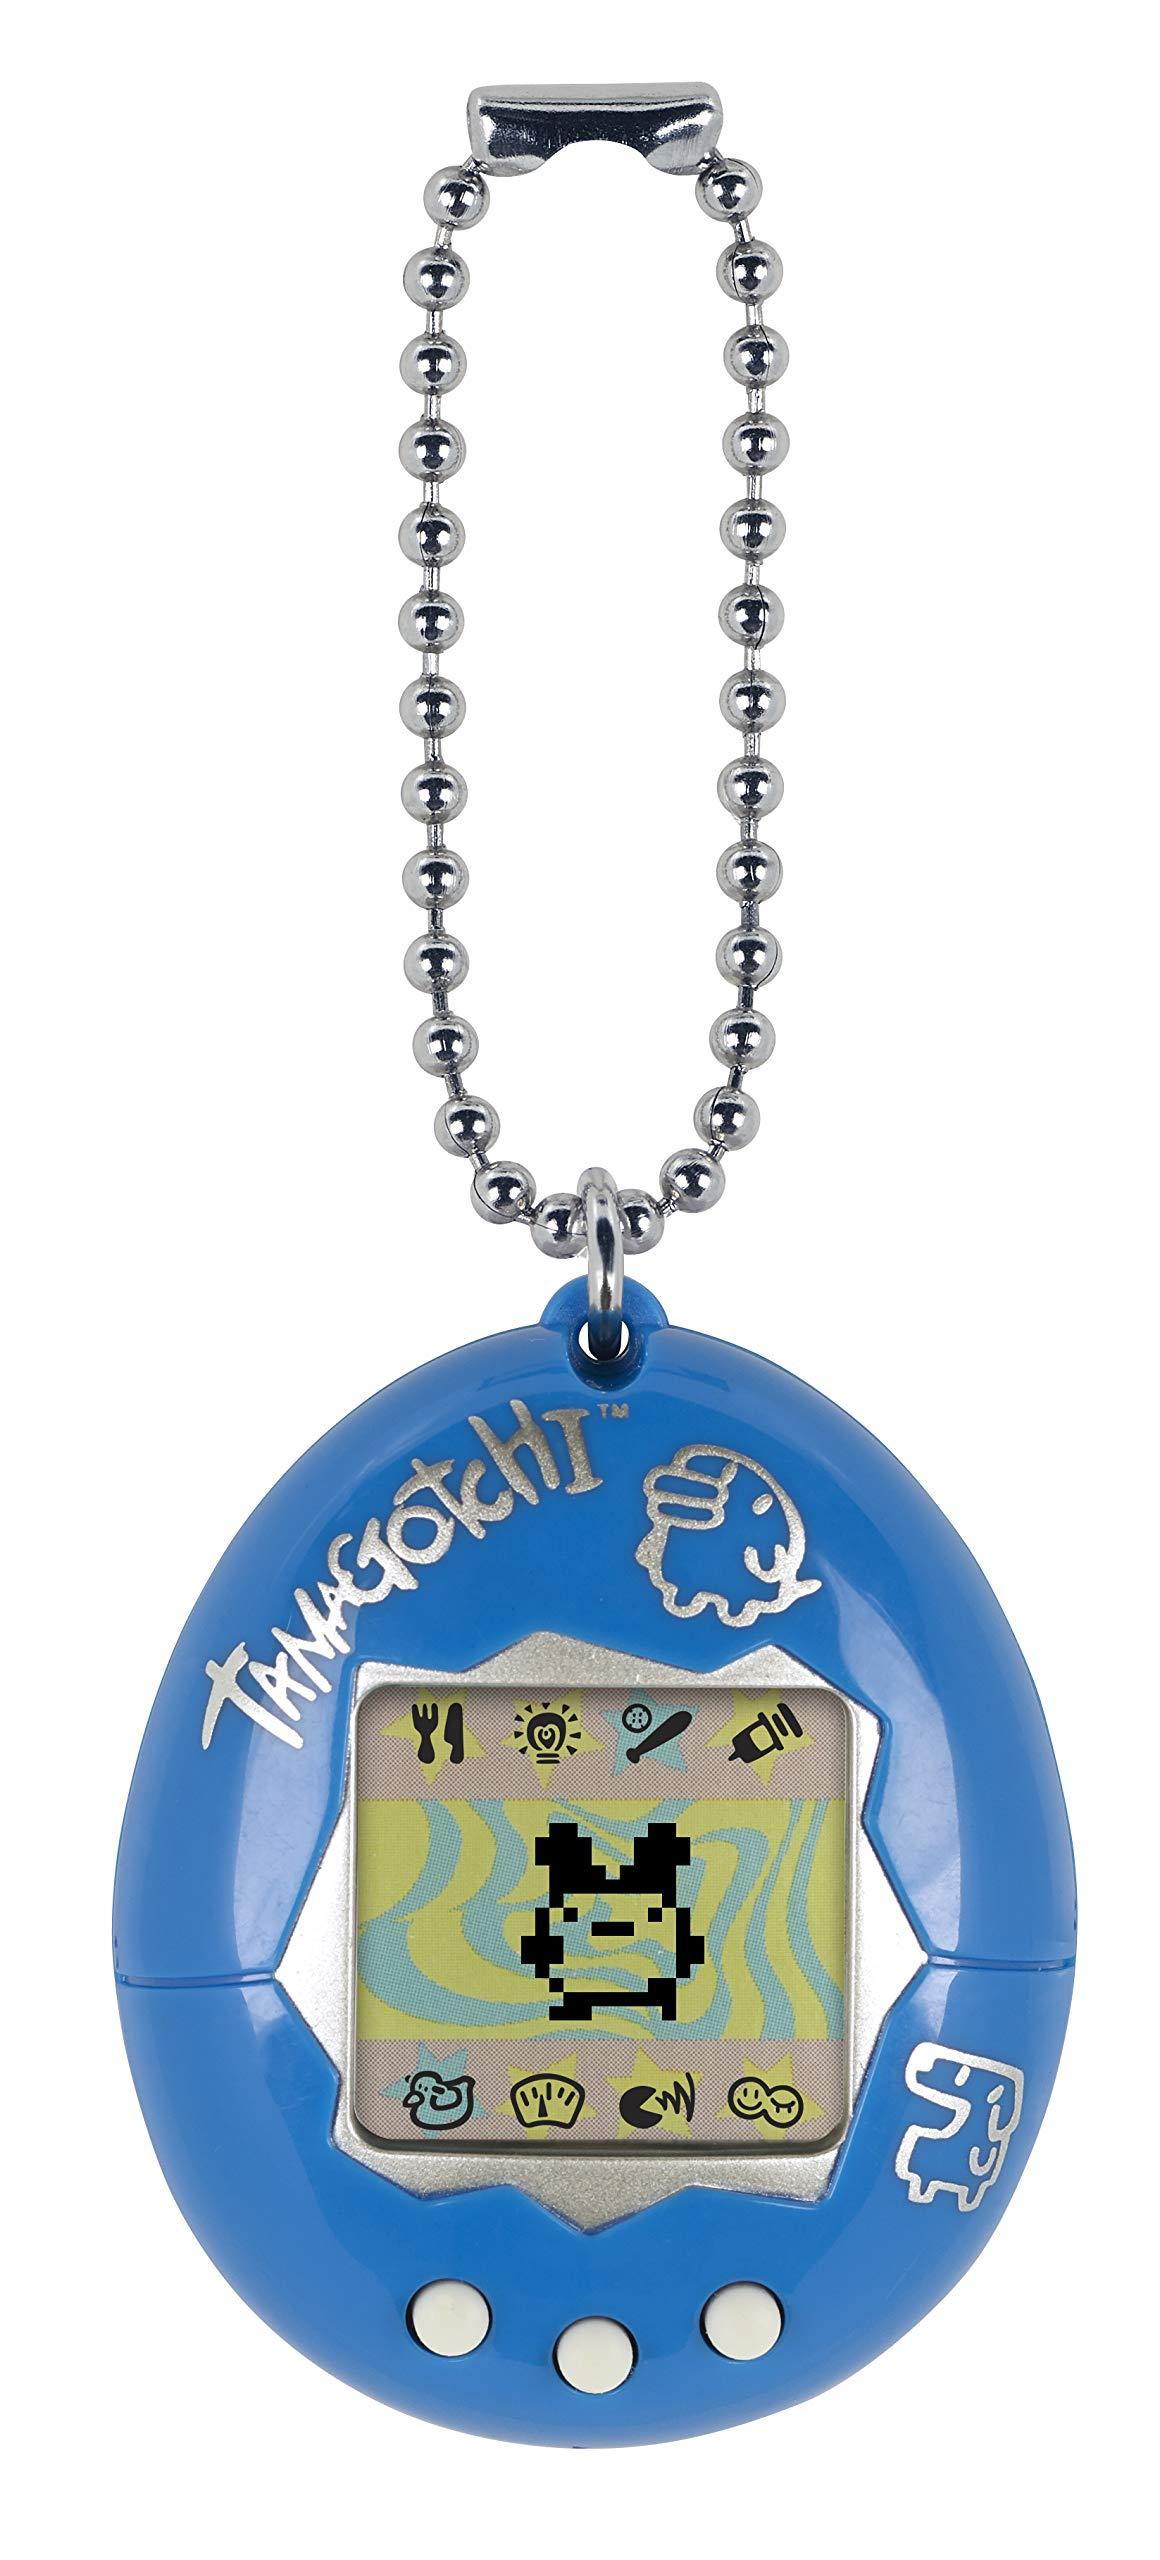 Tamagotchi Electronic Game, Blue/Silver